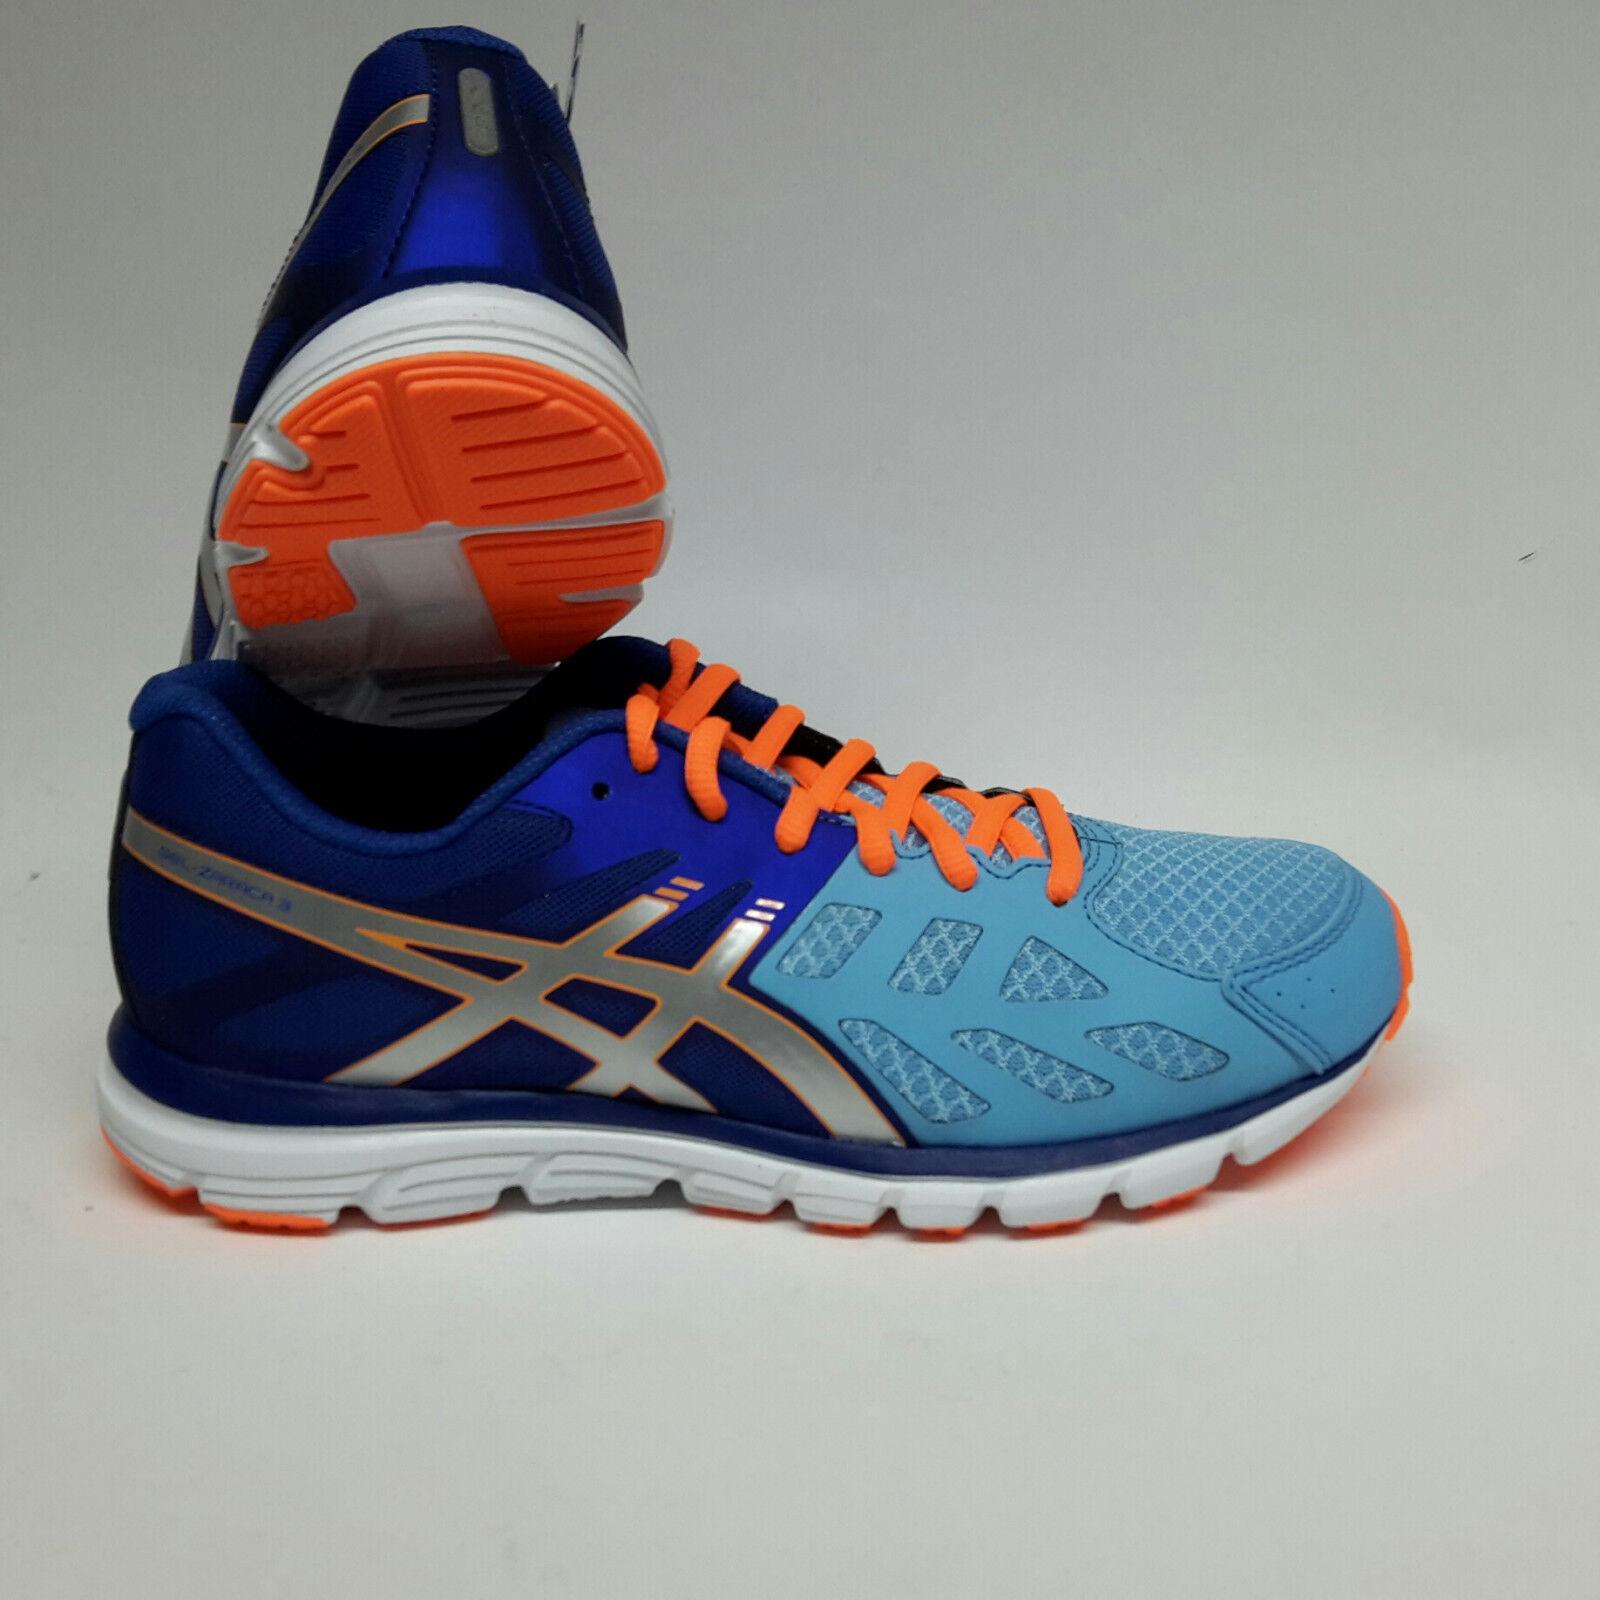 Asics Gel Zaraca 3 soft Blau/silver/ nec Damens Damen Laufschuhe Gr. UK 6 / 39,5